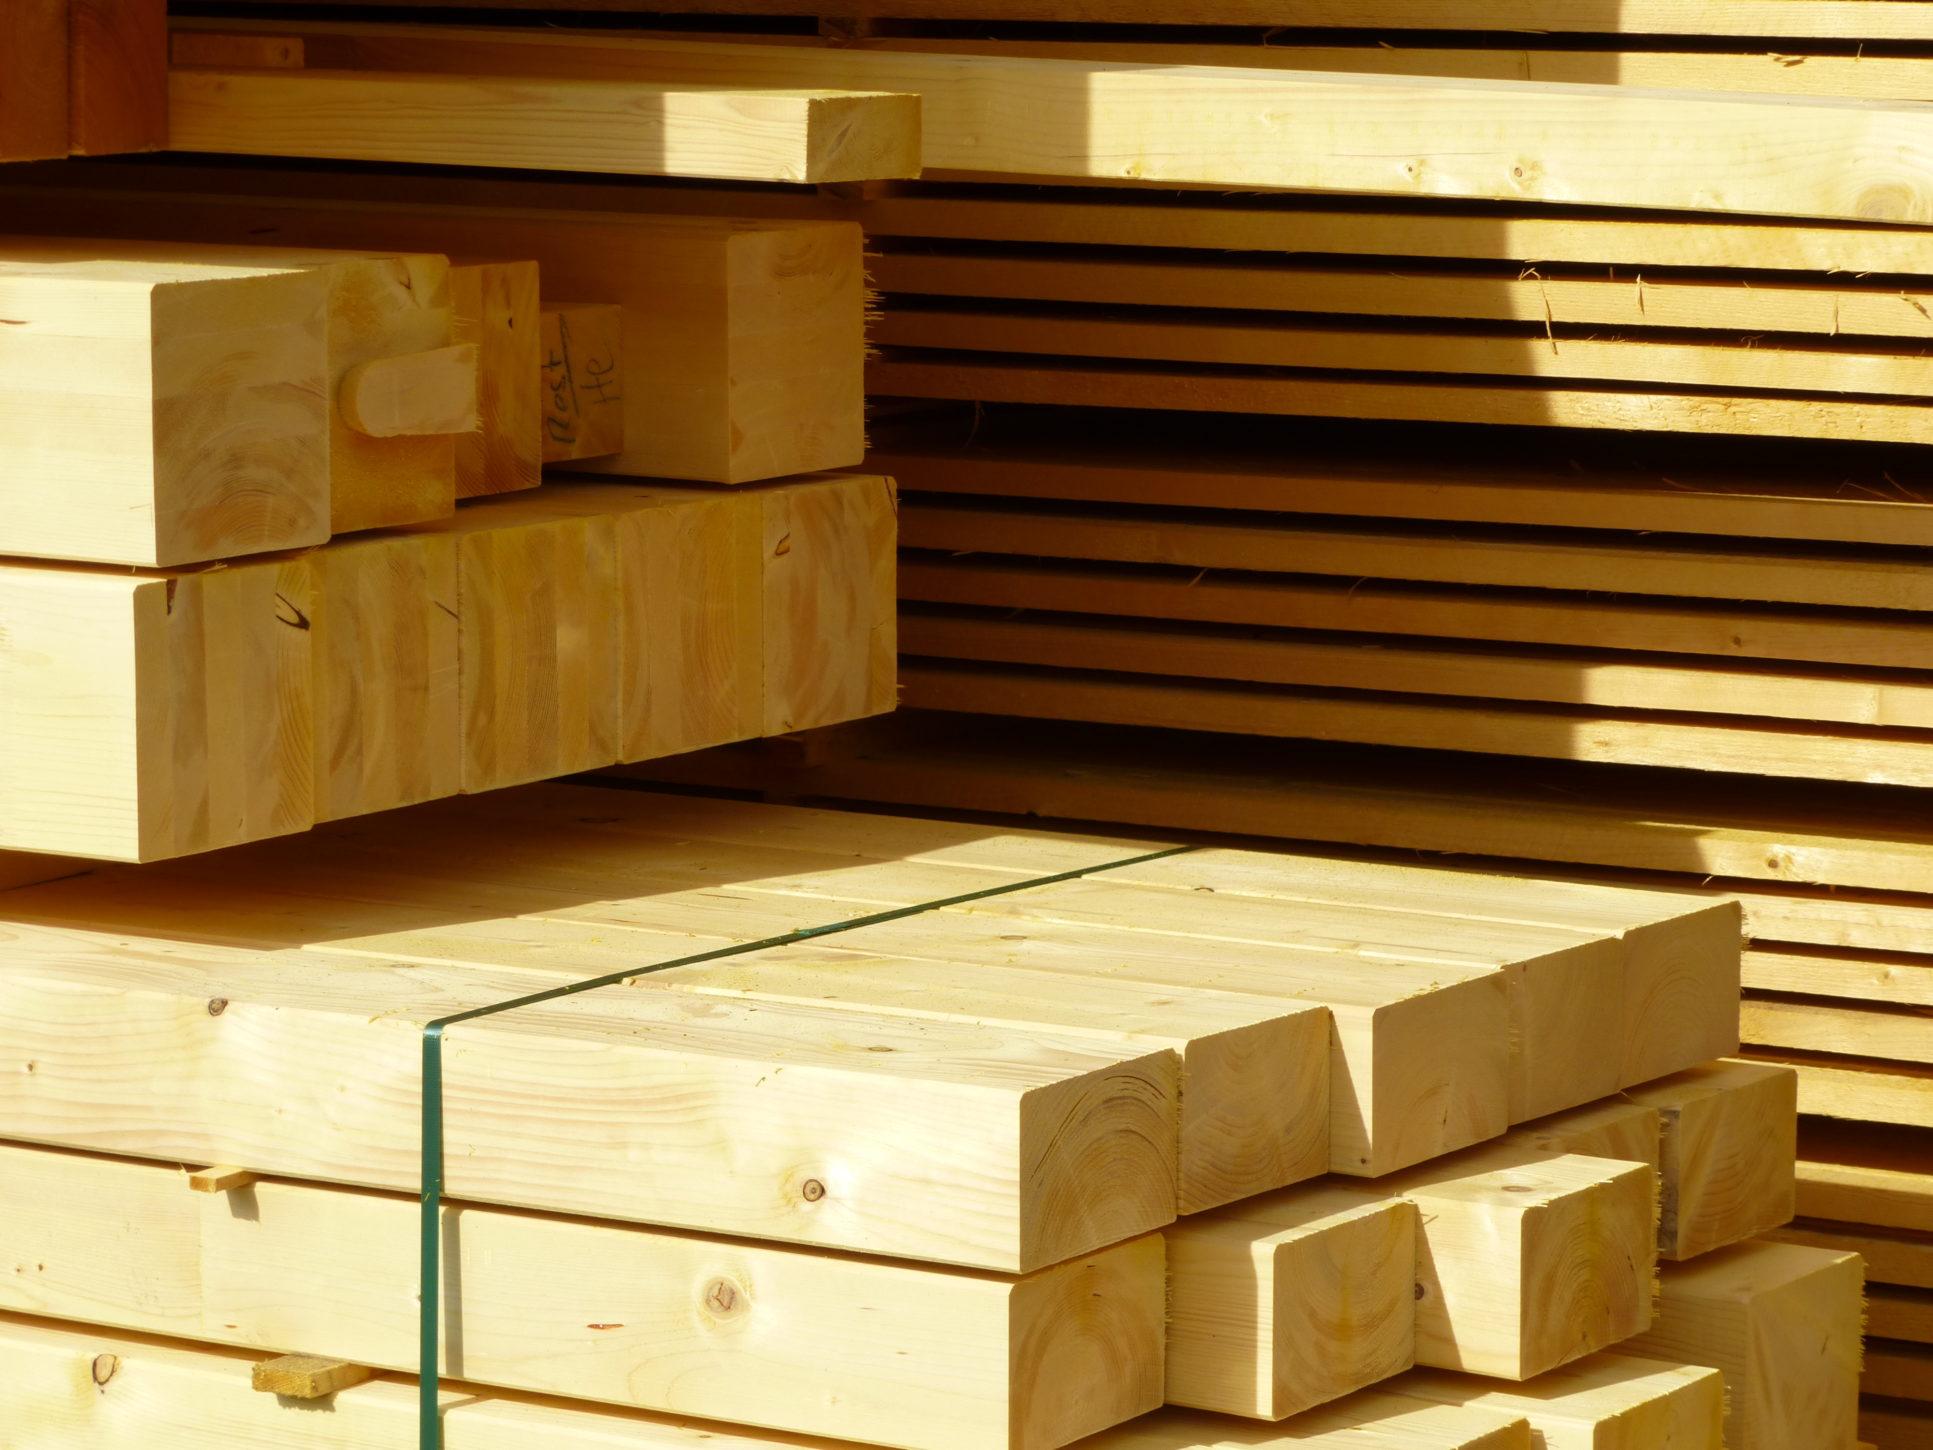 Charta für Holz 2.0